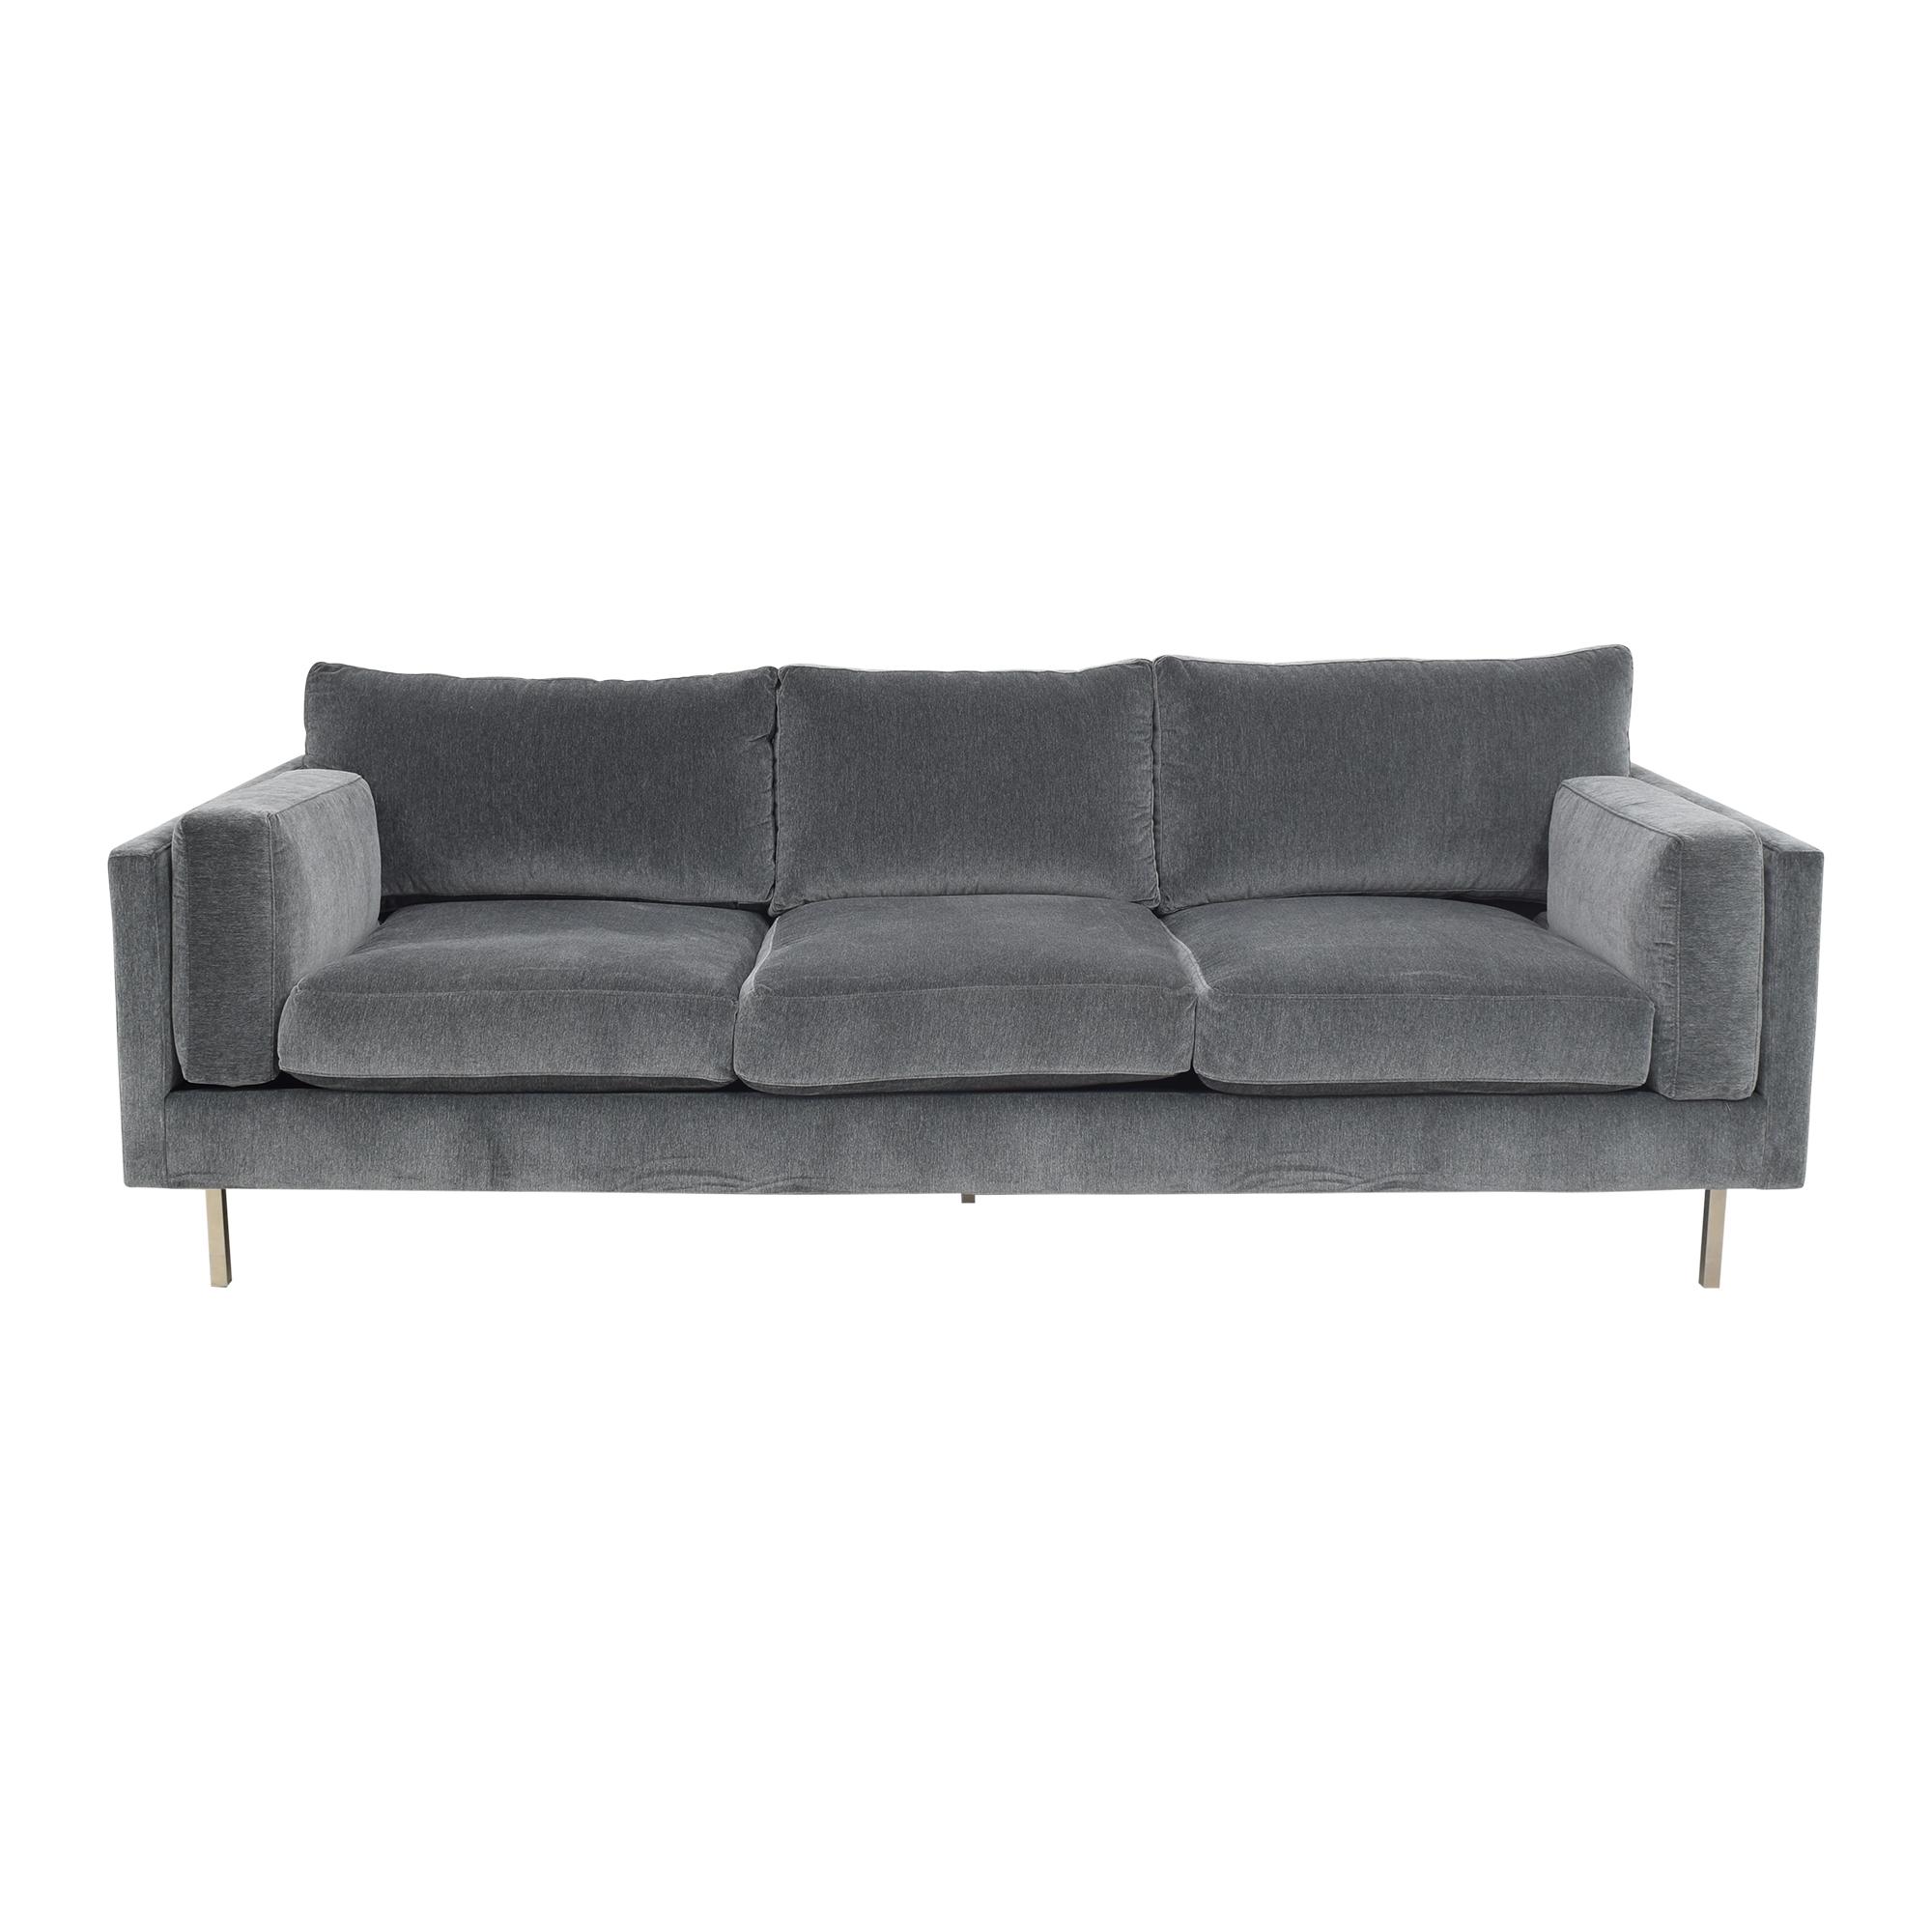 BenchMade Modern Skinny Fat Sofa sale